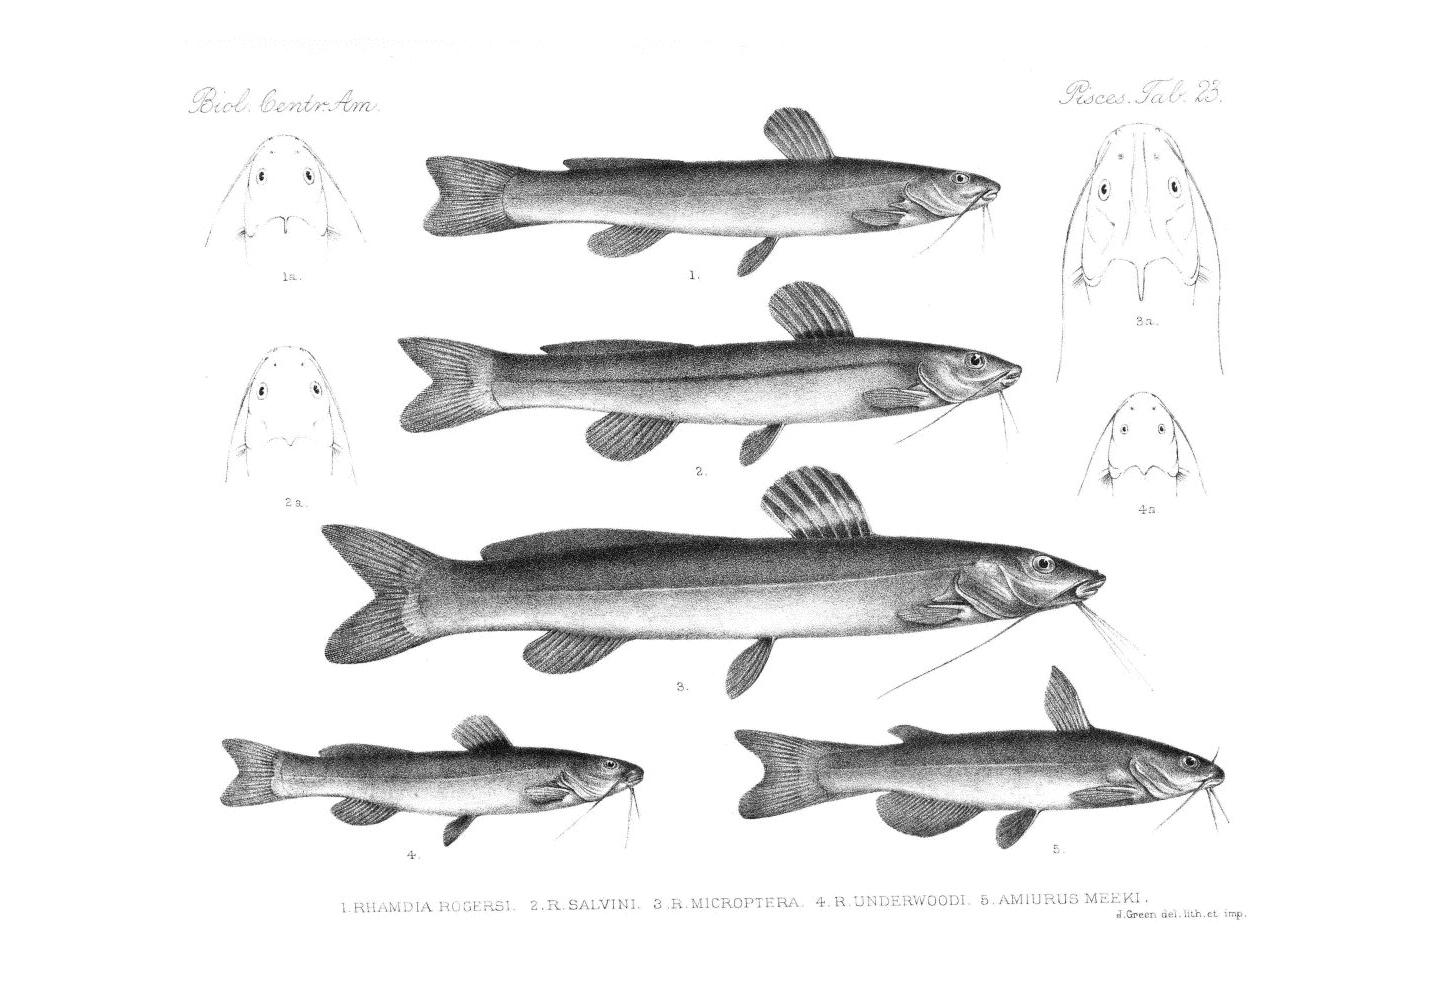 Fish,  Image number:bca_05_00_00_289